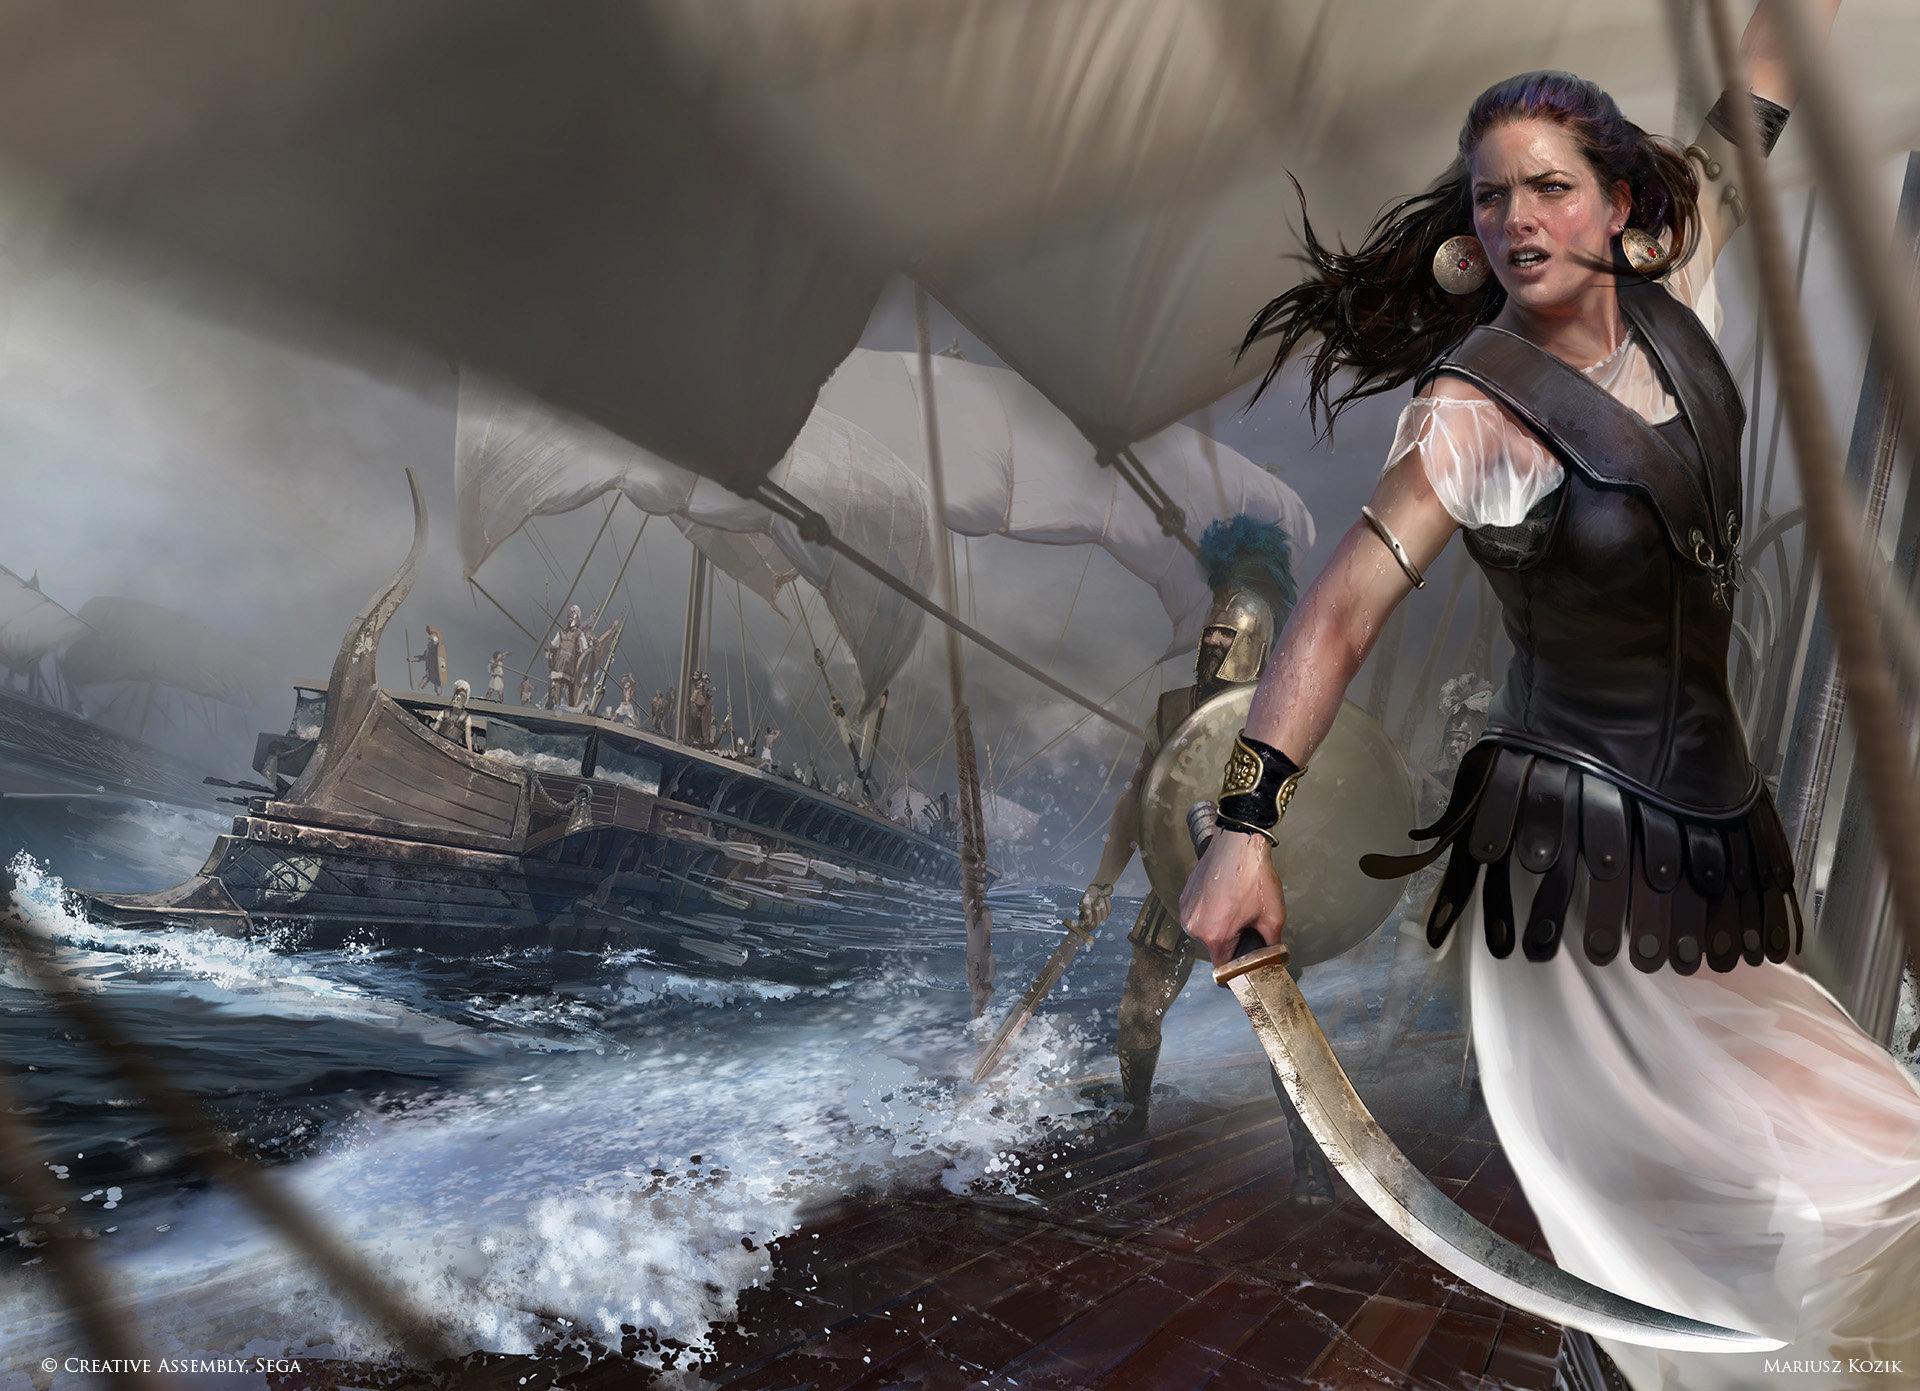 Queen Teuta by Mariusz Kozic